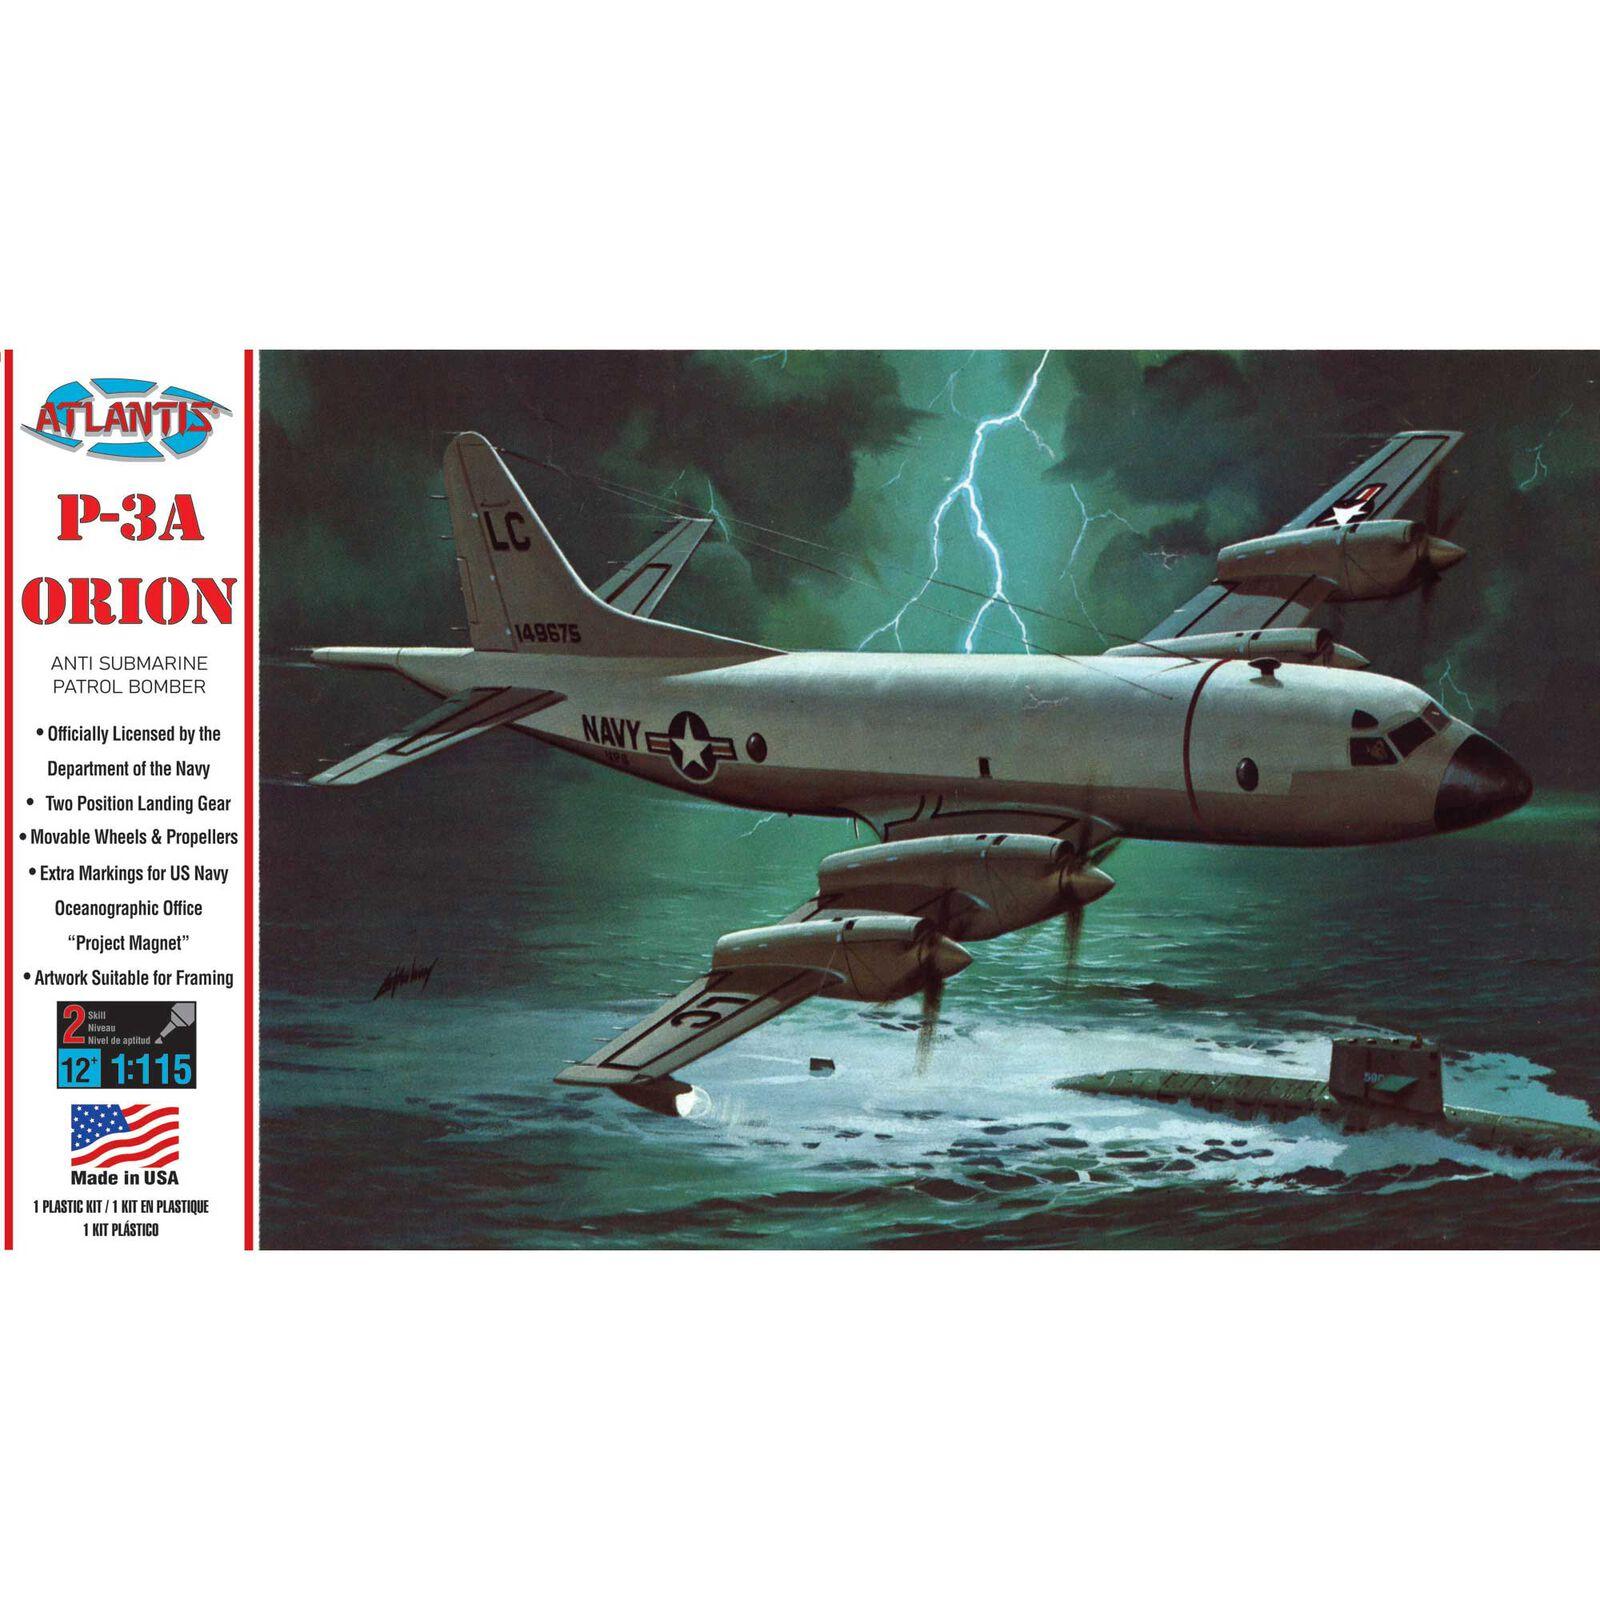 P-3A Orion US Navy Anti Submarine Patrol Bomber